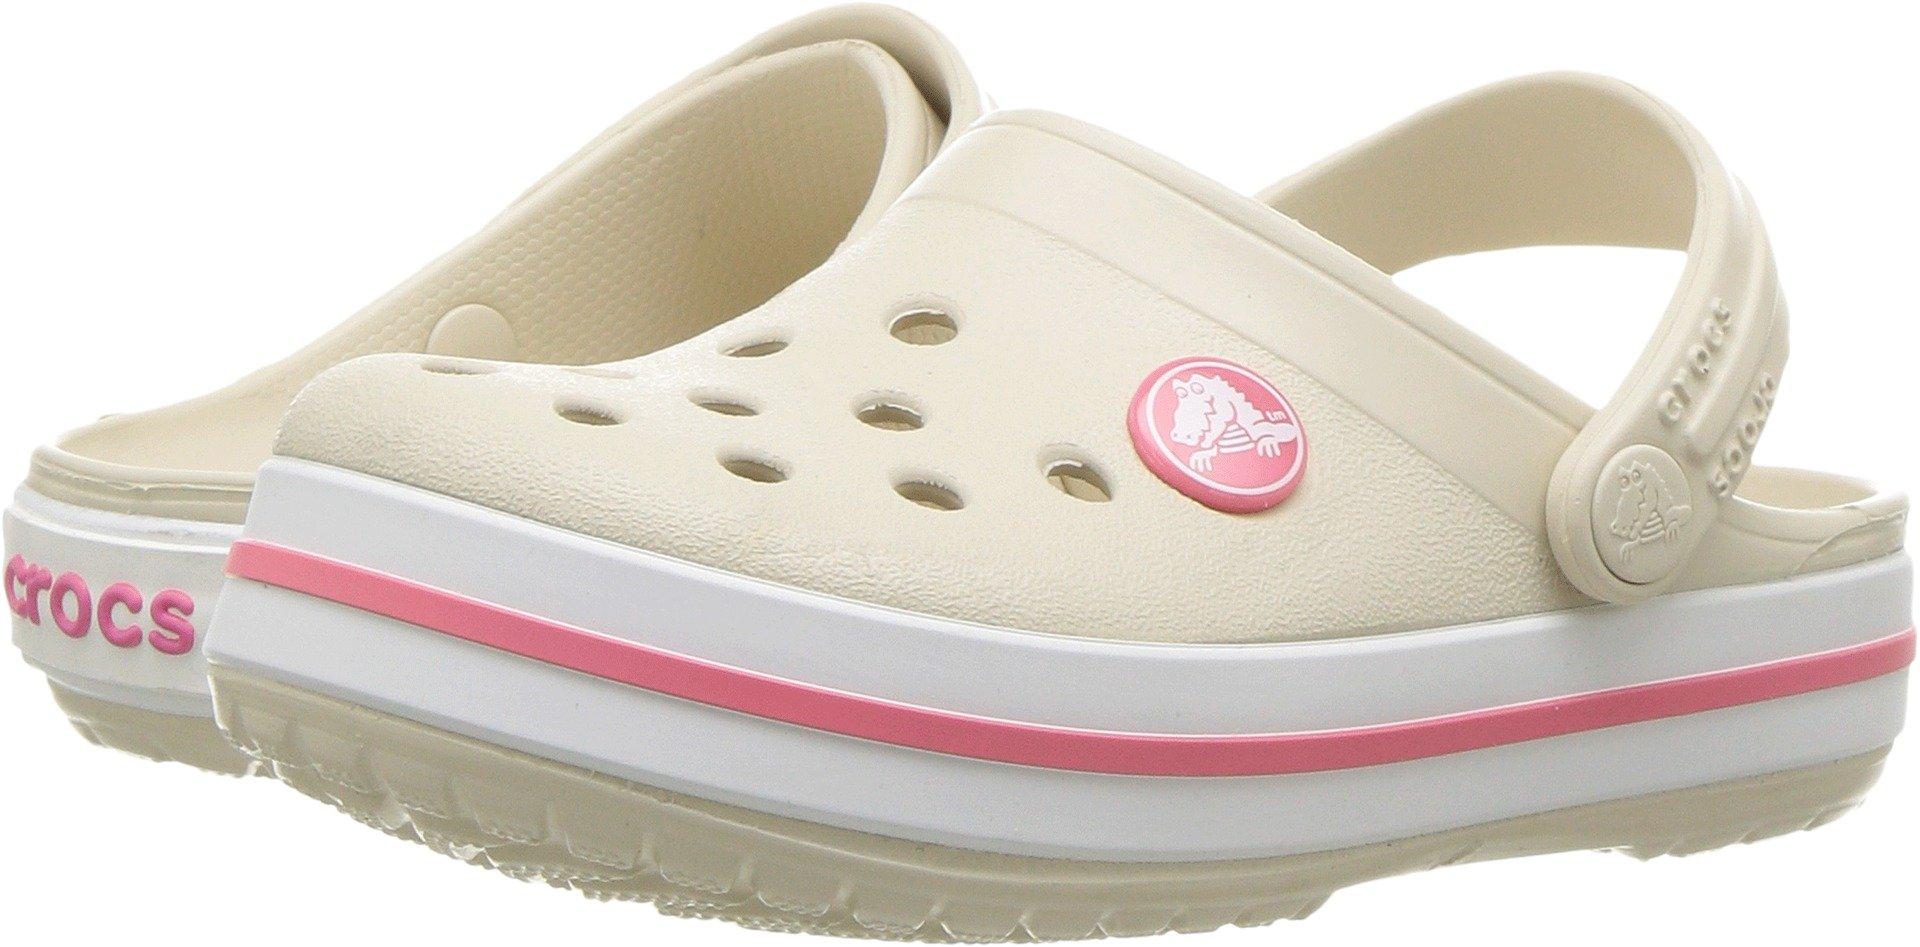 Crocs Girls' Crocband K Clog, Stucco/Melon, 12 M US Toddler